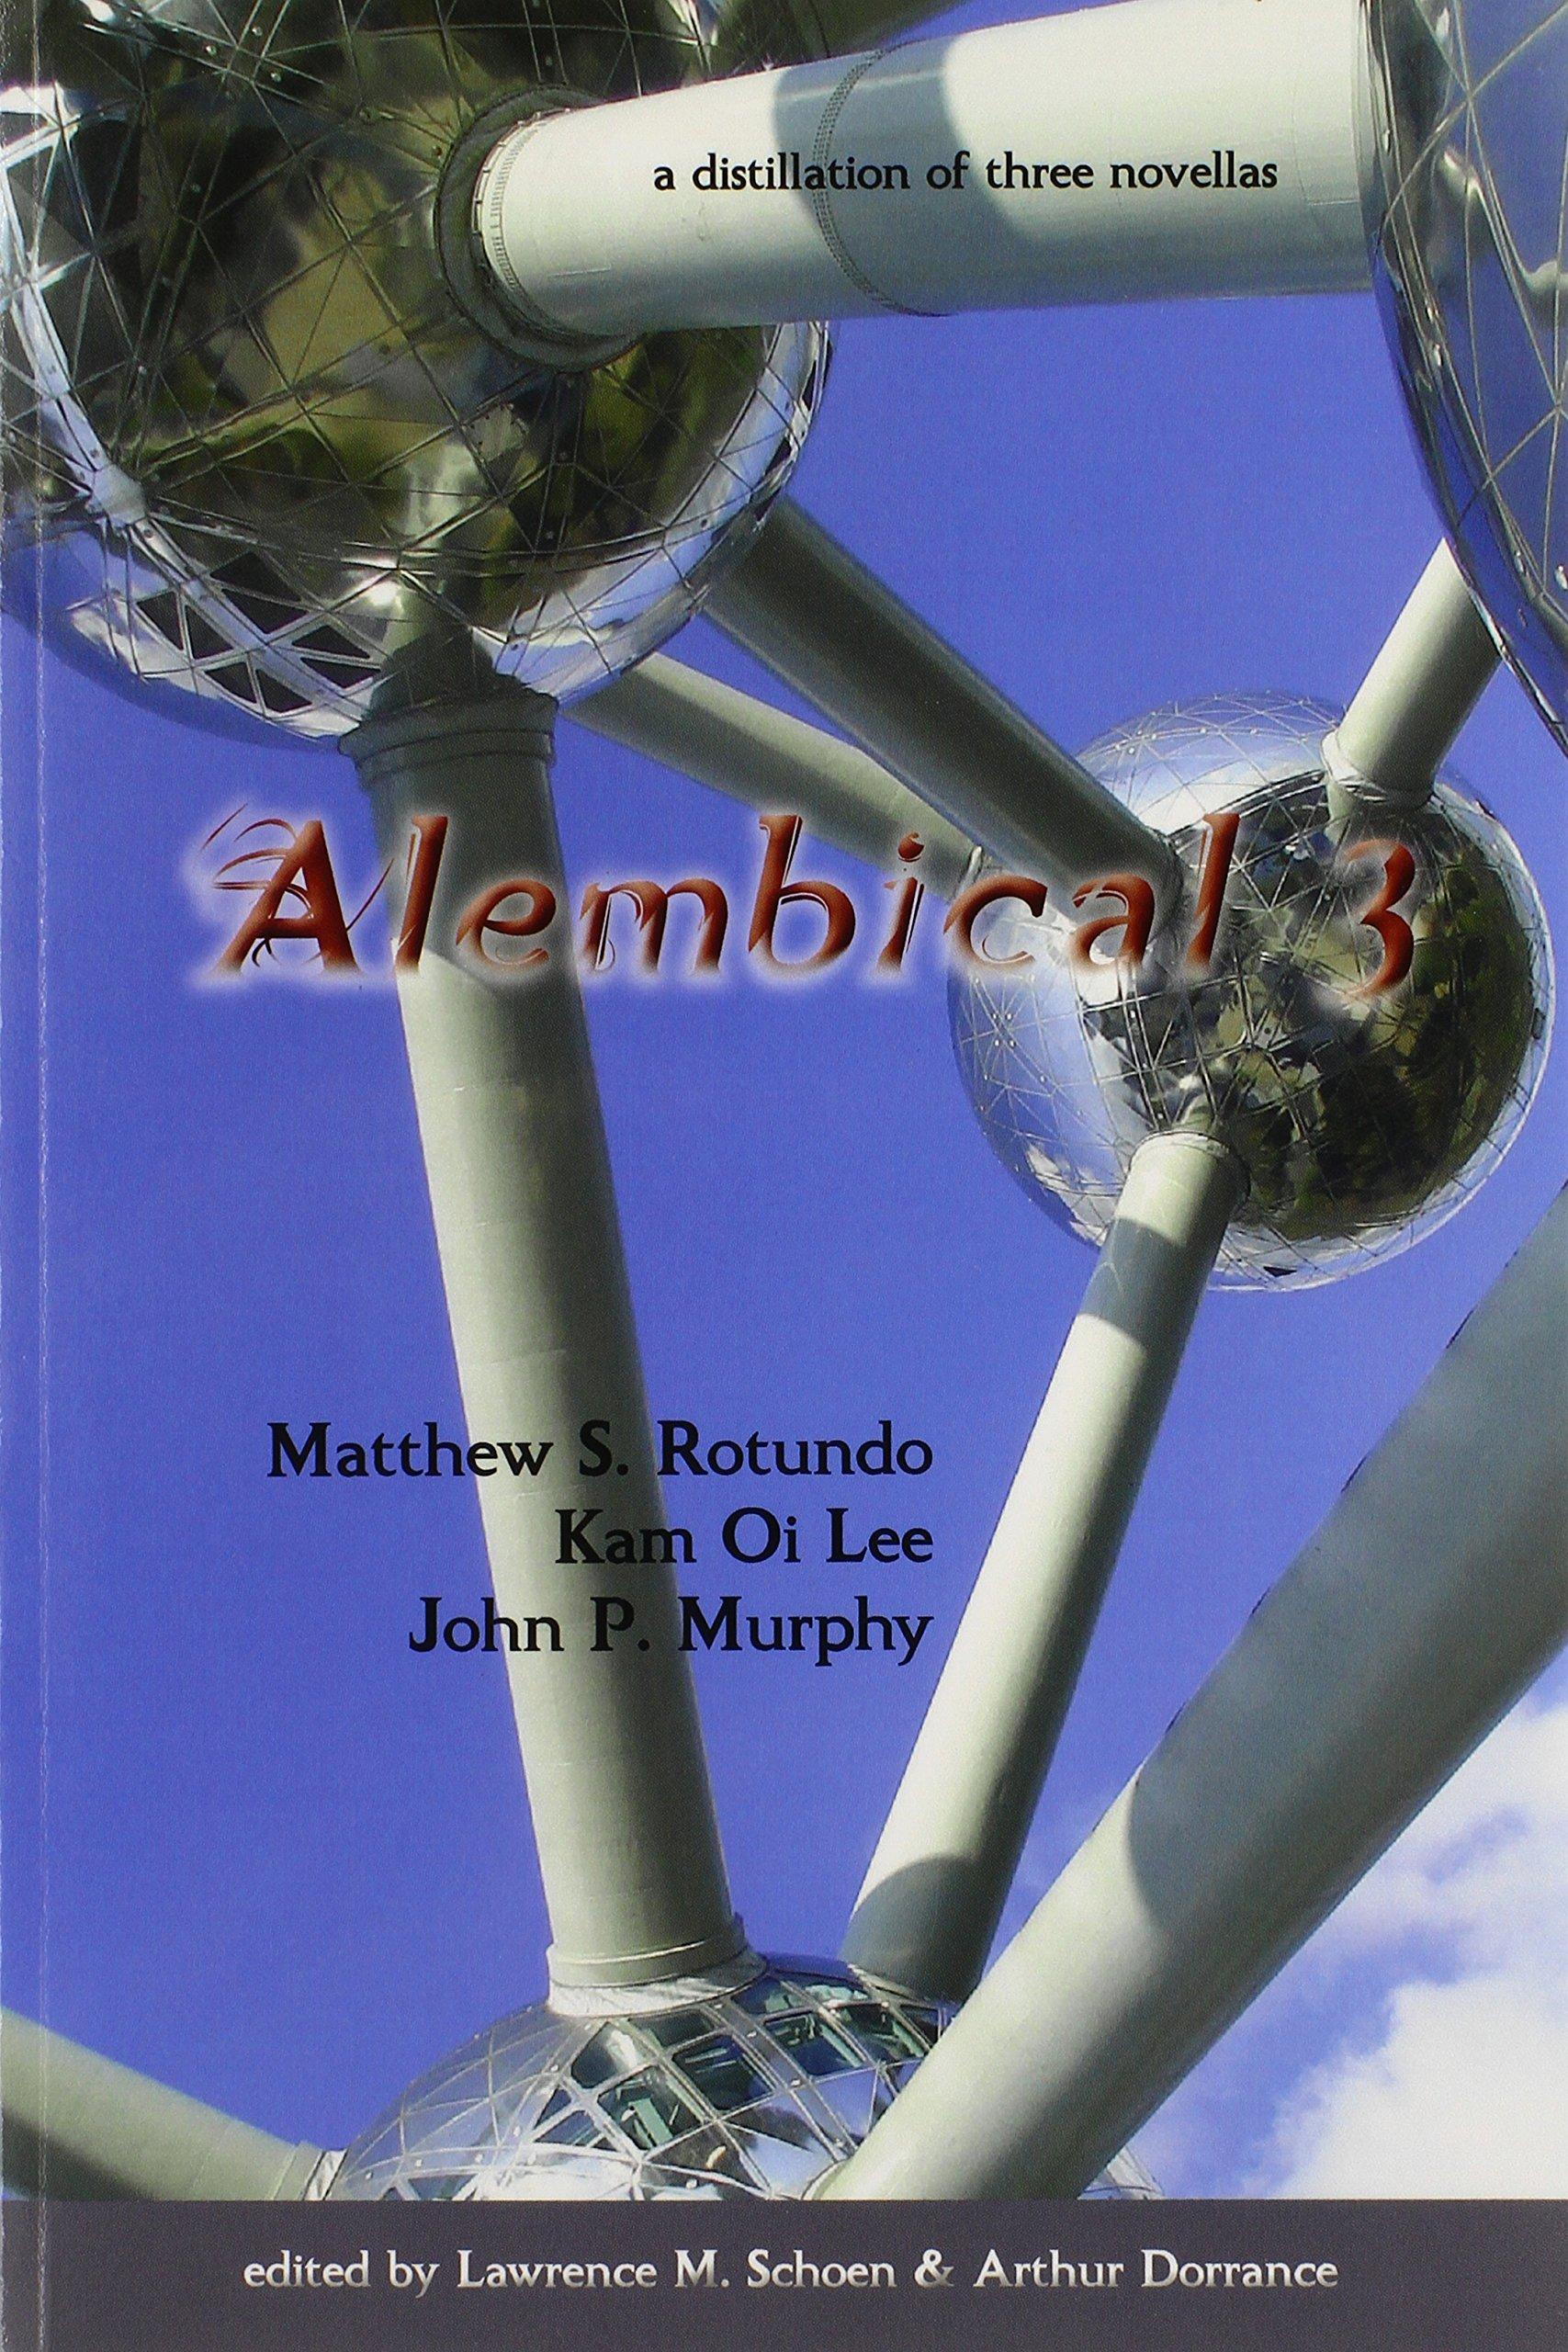 Download Alembical 3: A Distillation of Three Novellas ebook